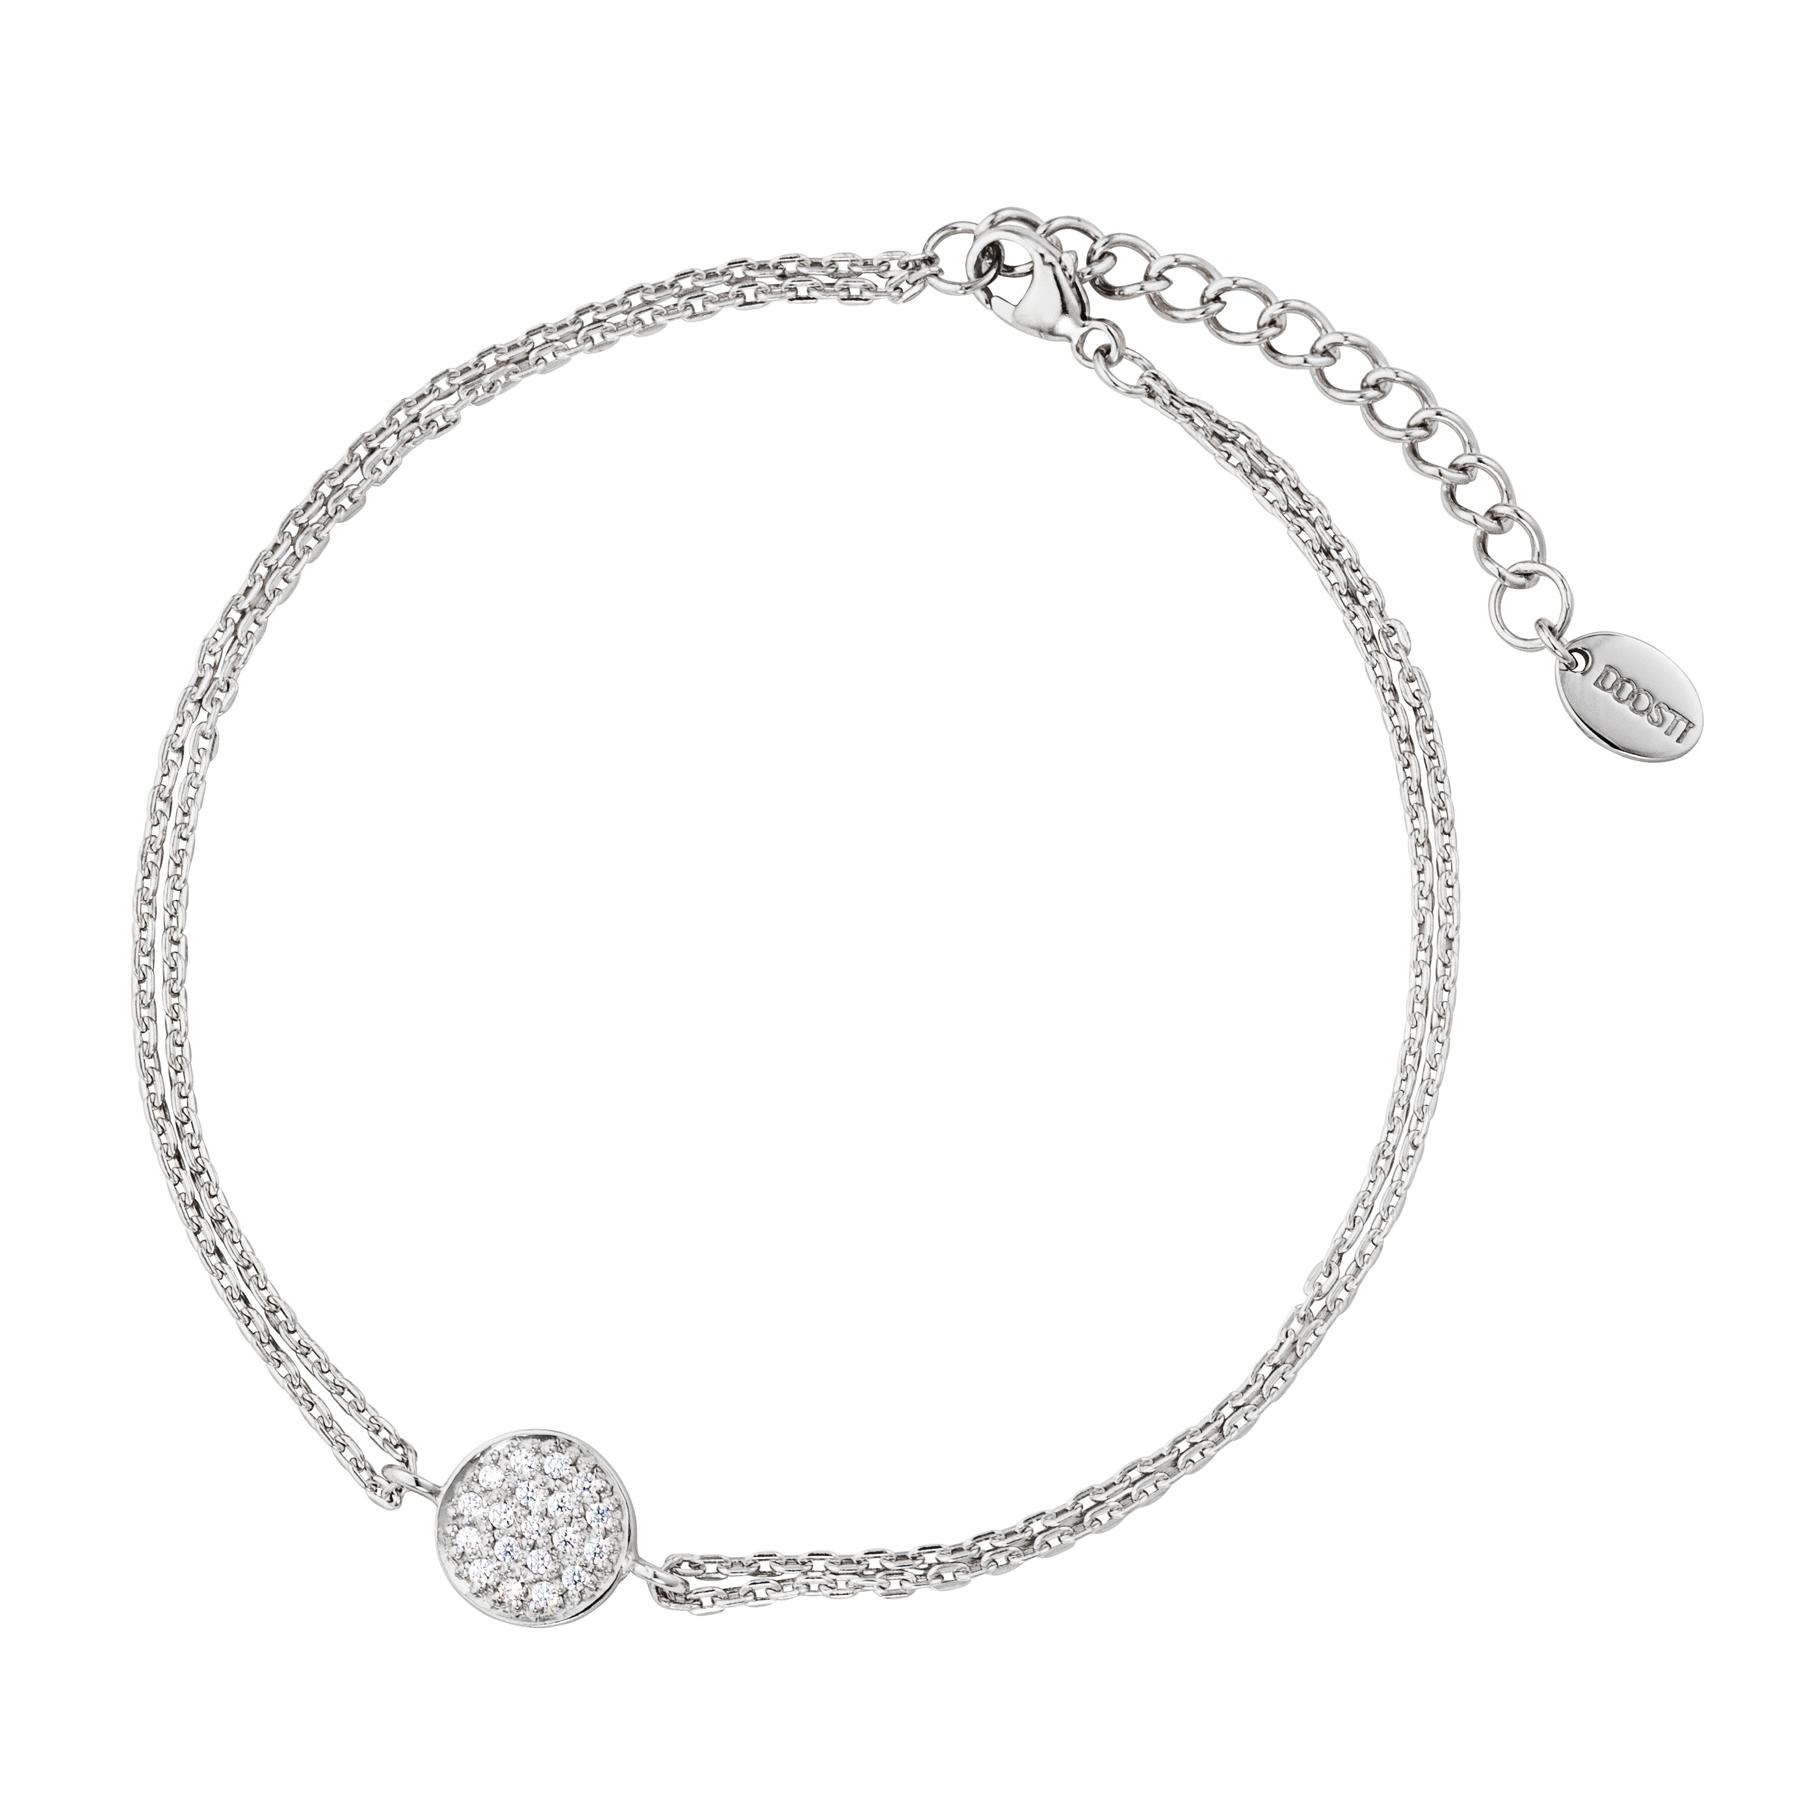 94389db04d02 DOOSTI Zartes Armband 925 Silber rhodiniert